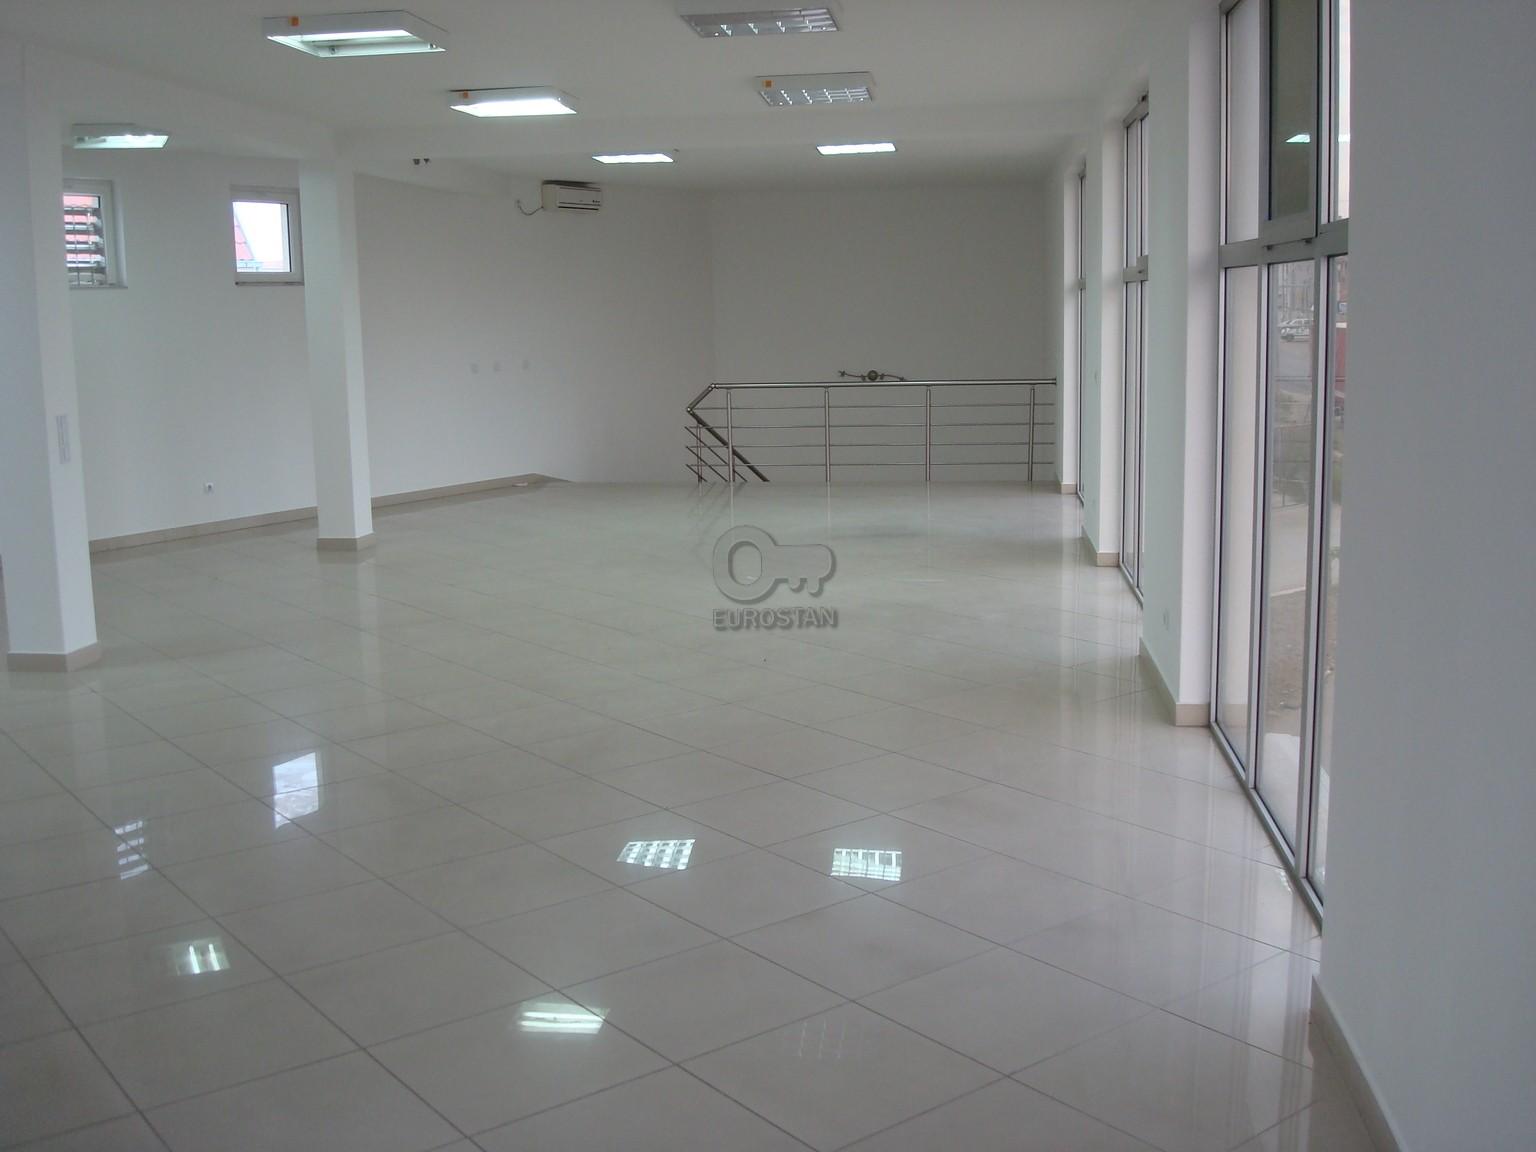 Poslovni prostor LEDINE 1300 EUR